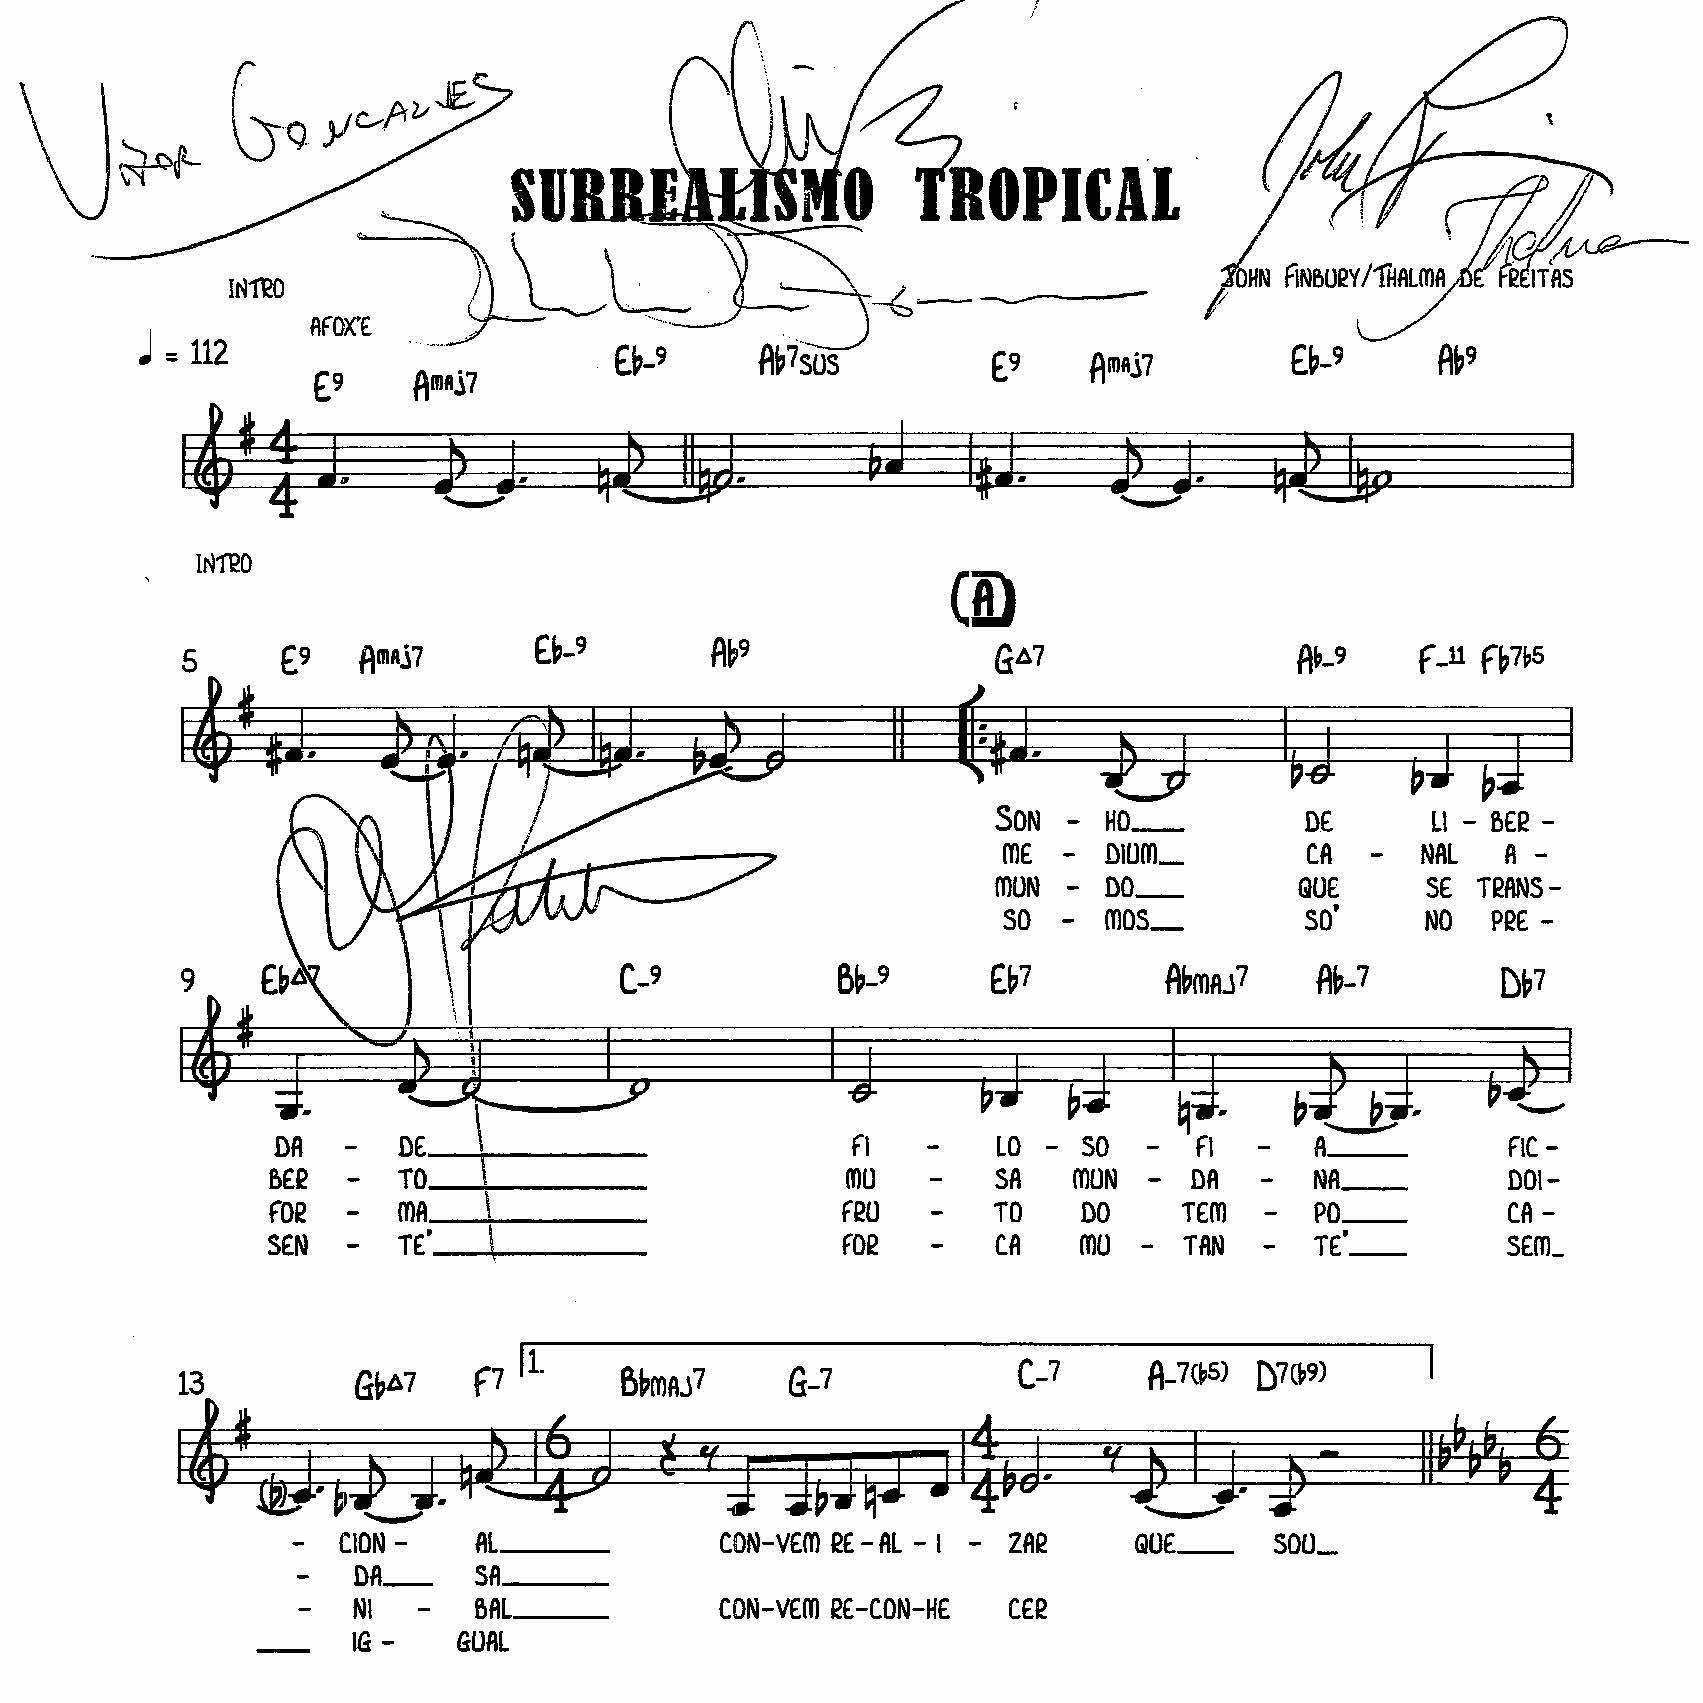 Surrealismo-Tropical-Autographed